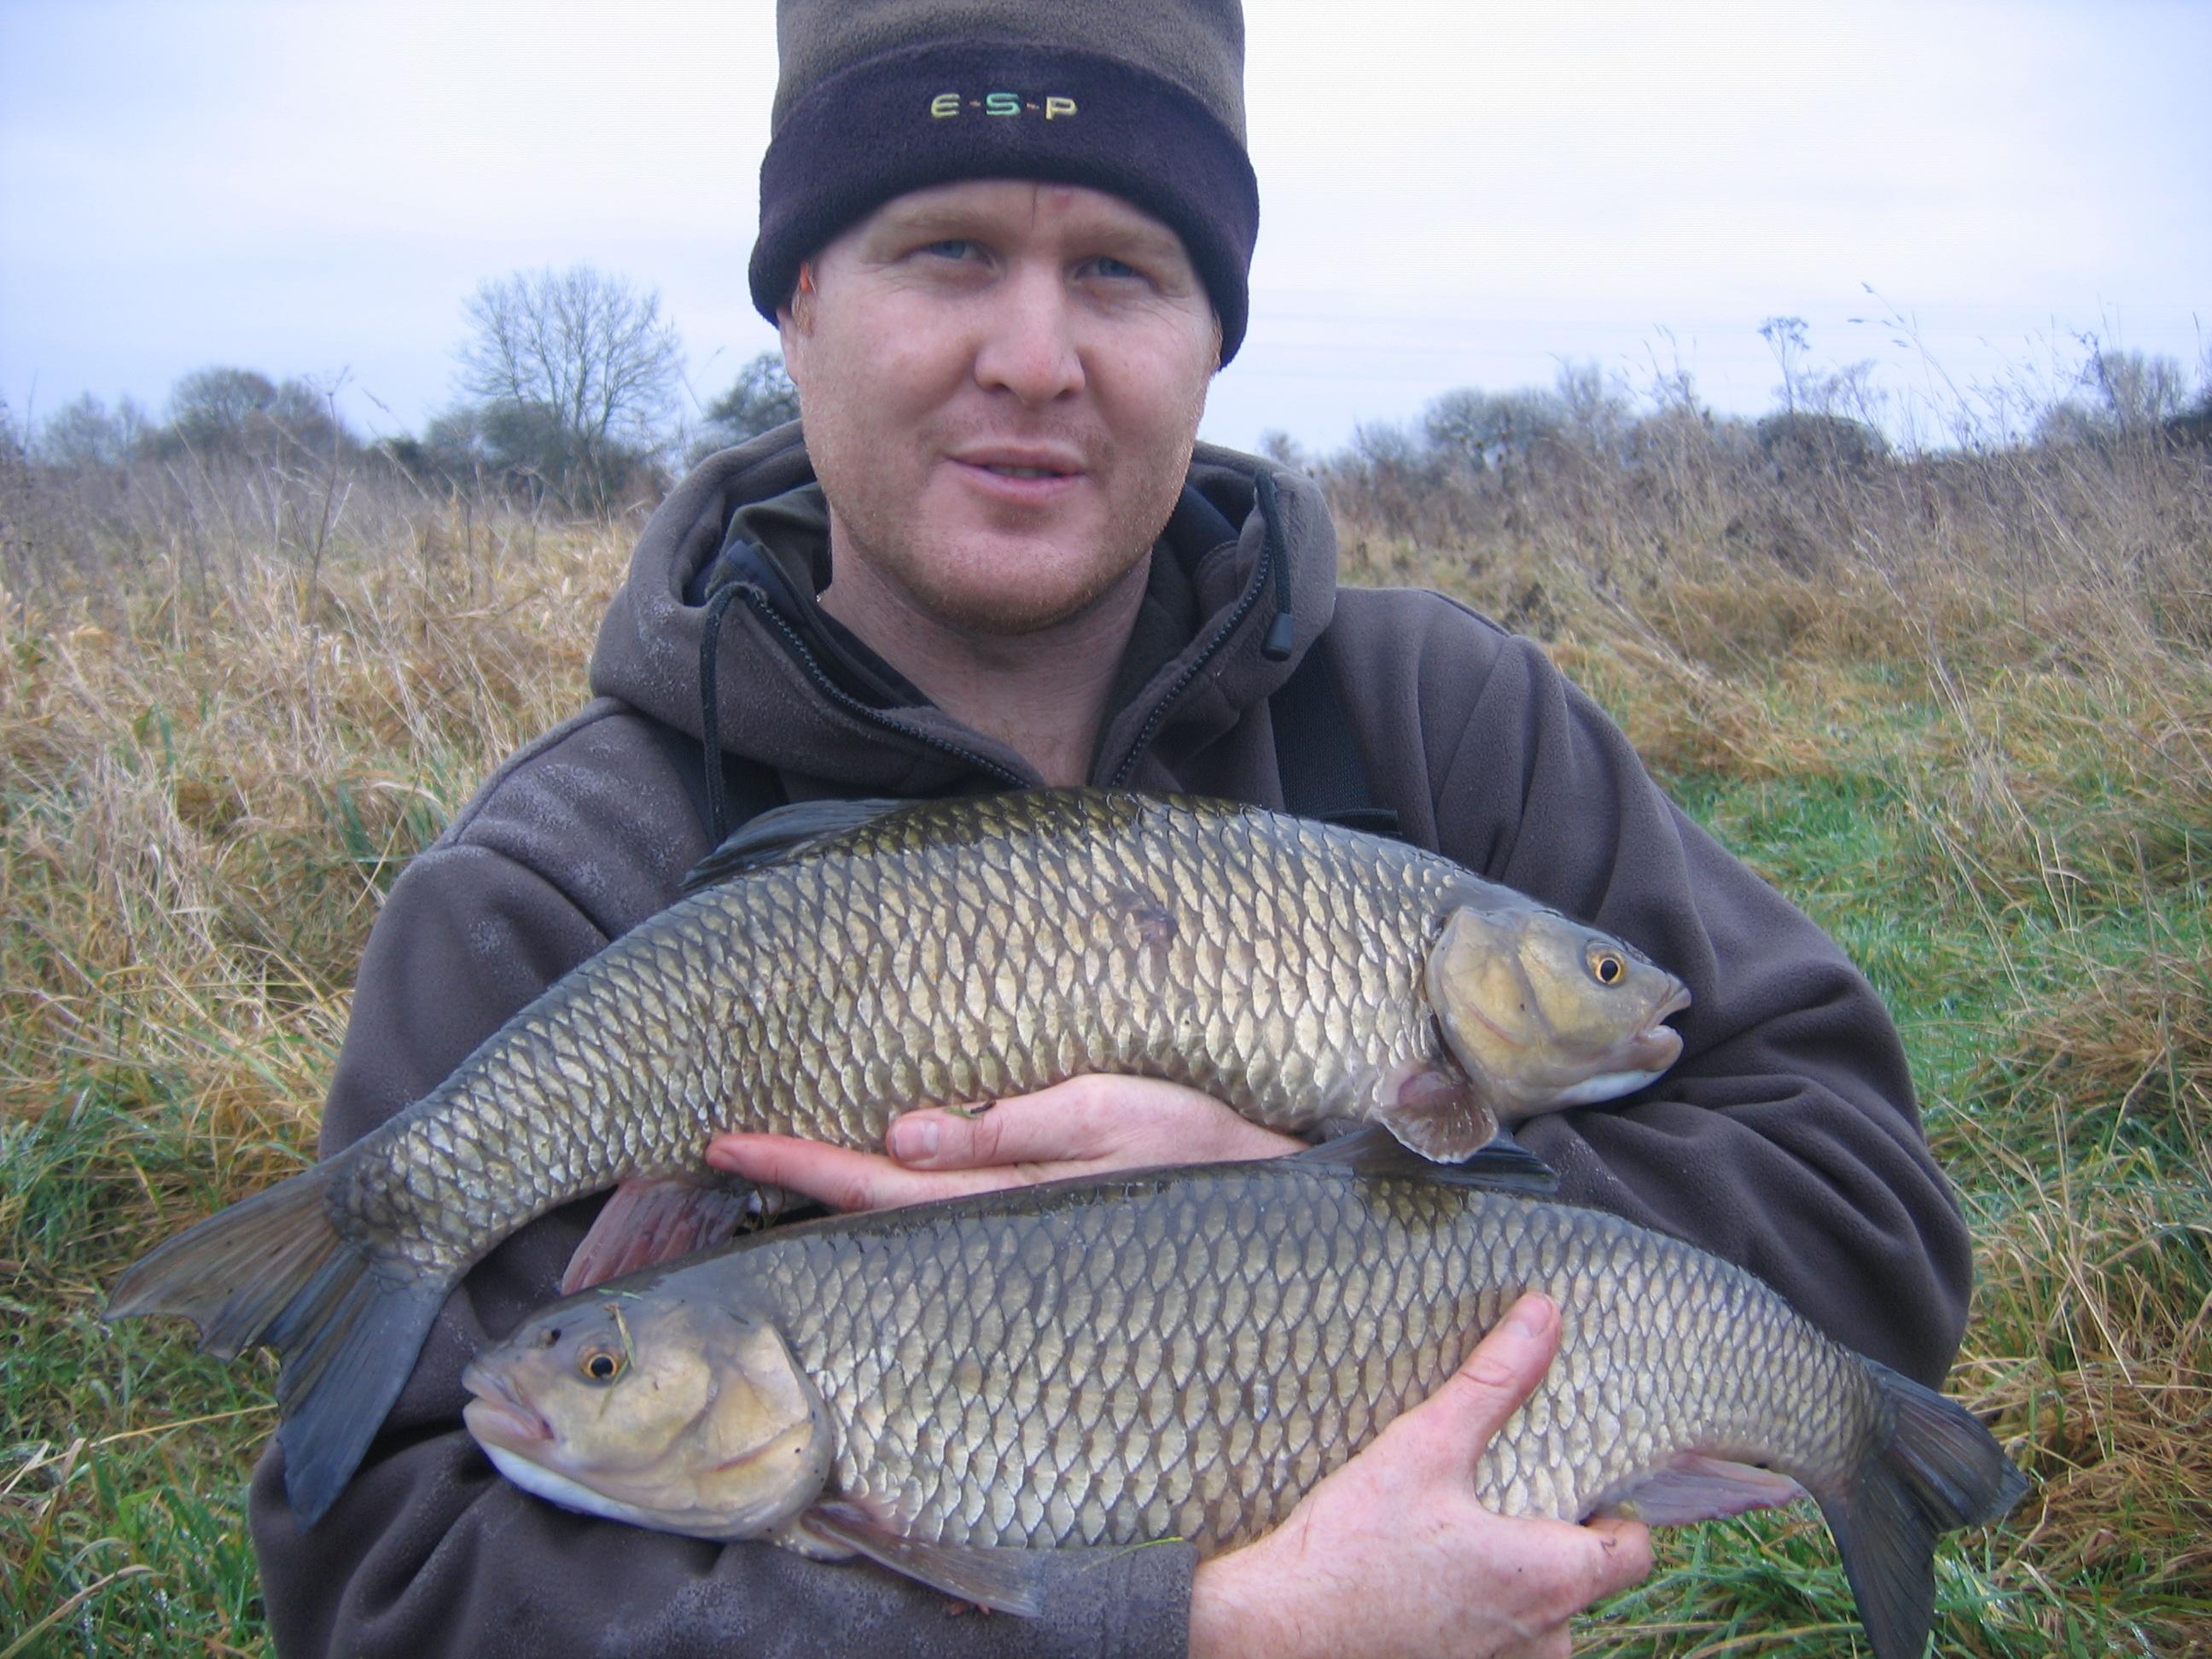 Chub Fishing Tackle   To Catch Big Chub On The Float